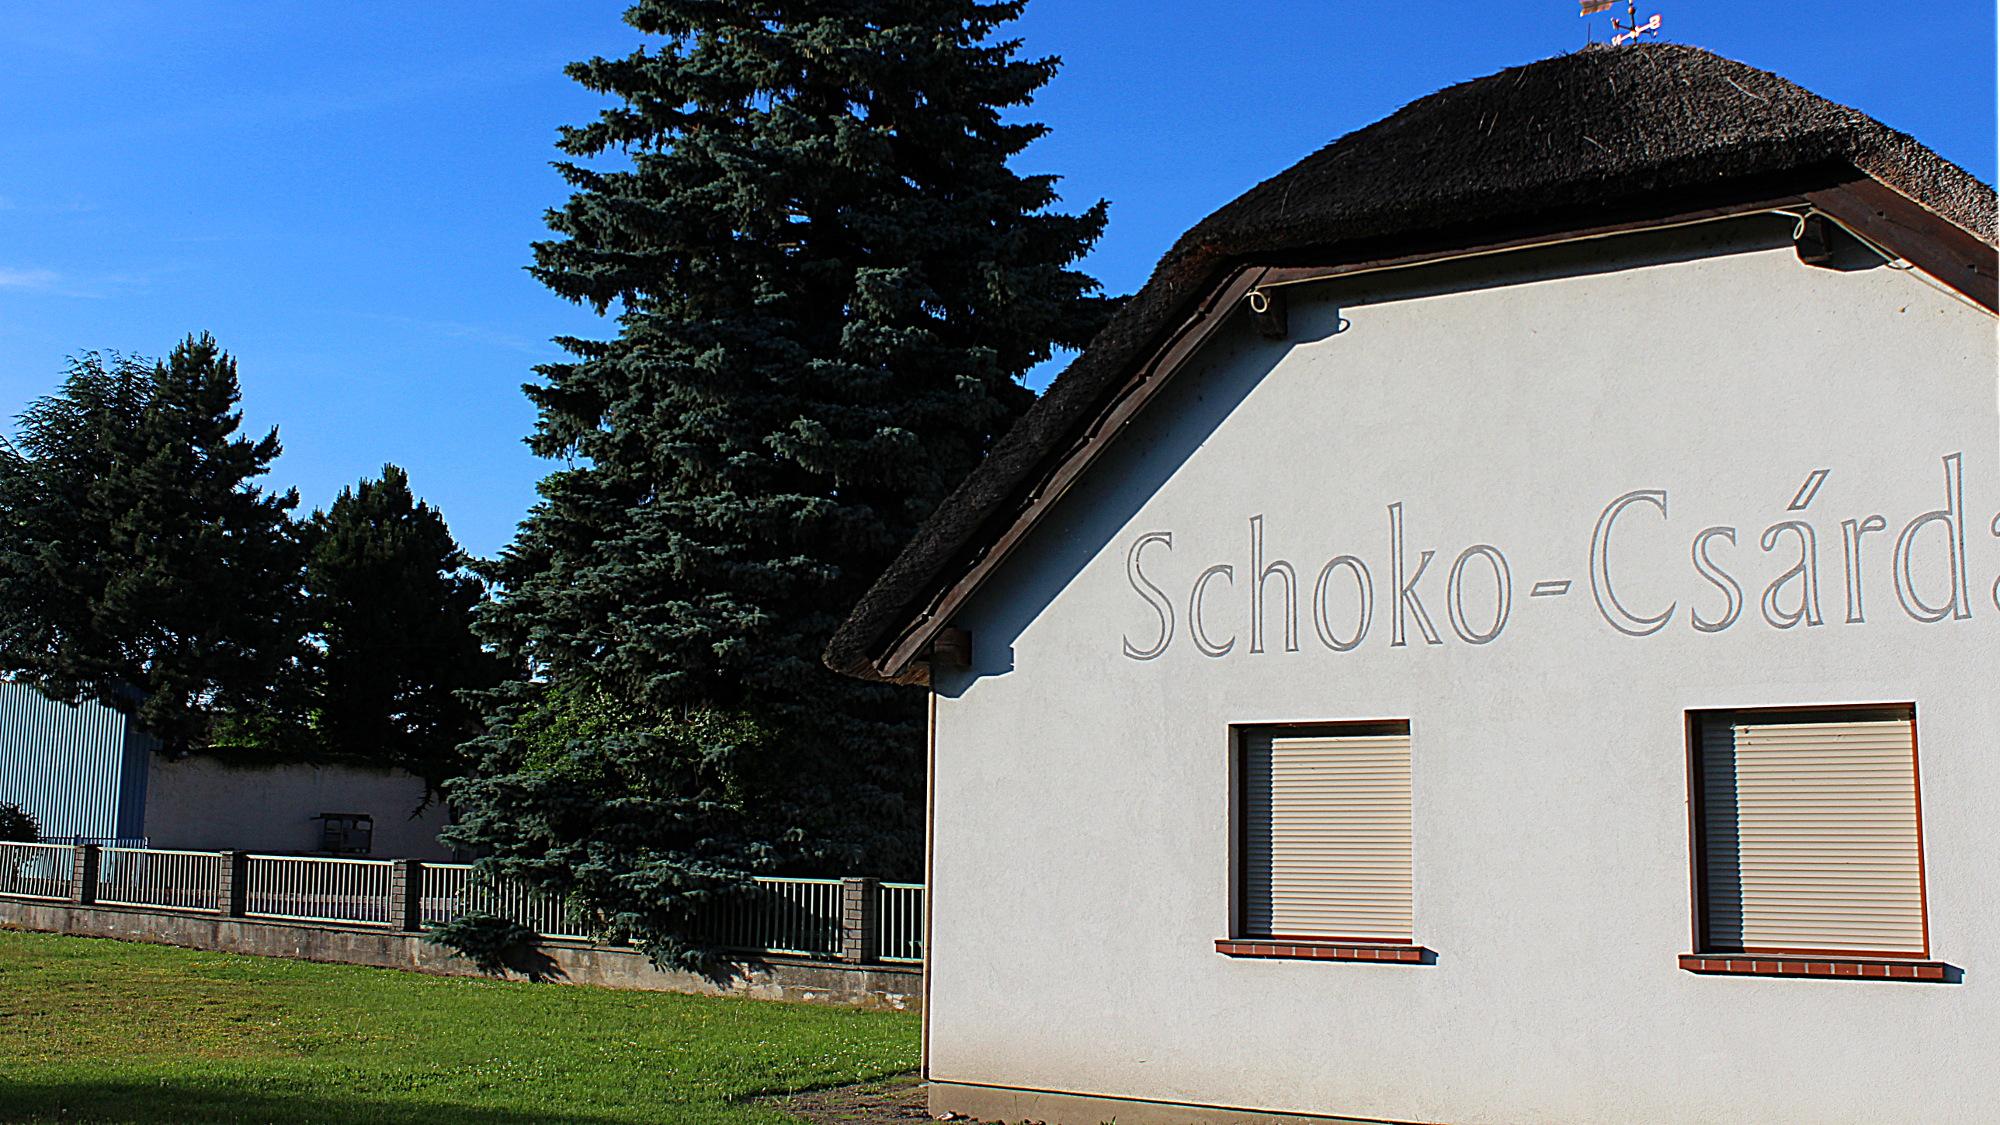 Schoko-Csárd chocolate factory building in Kittsee, Austria.